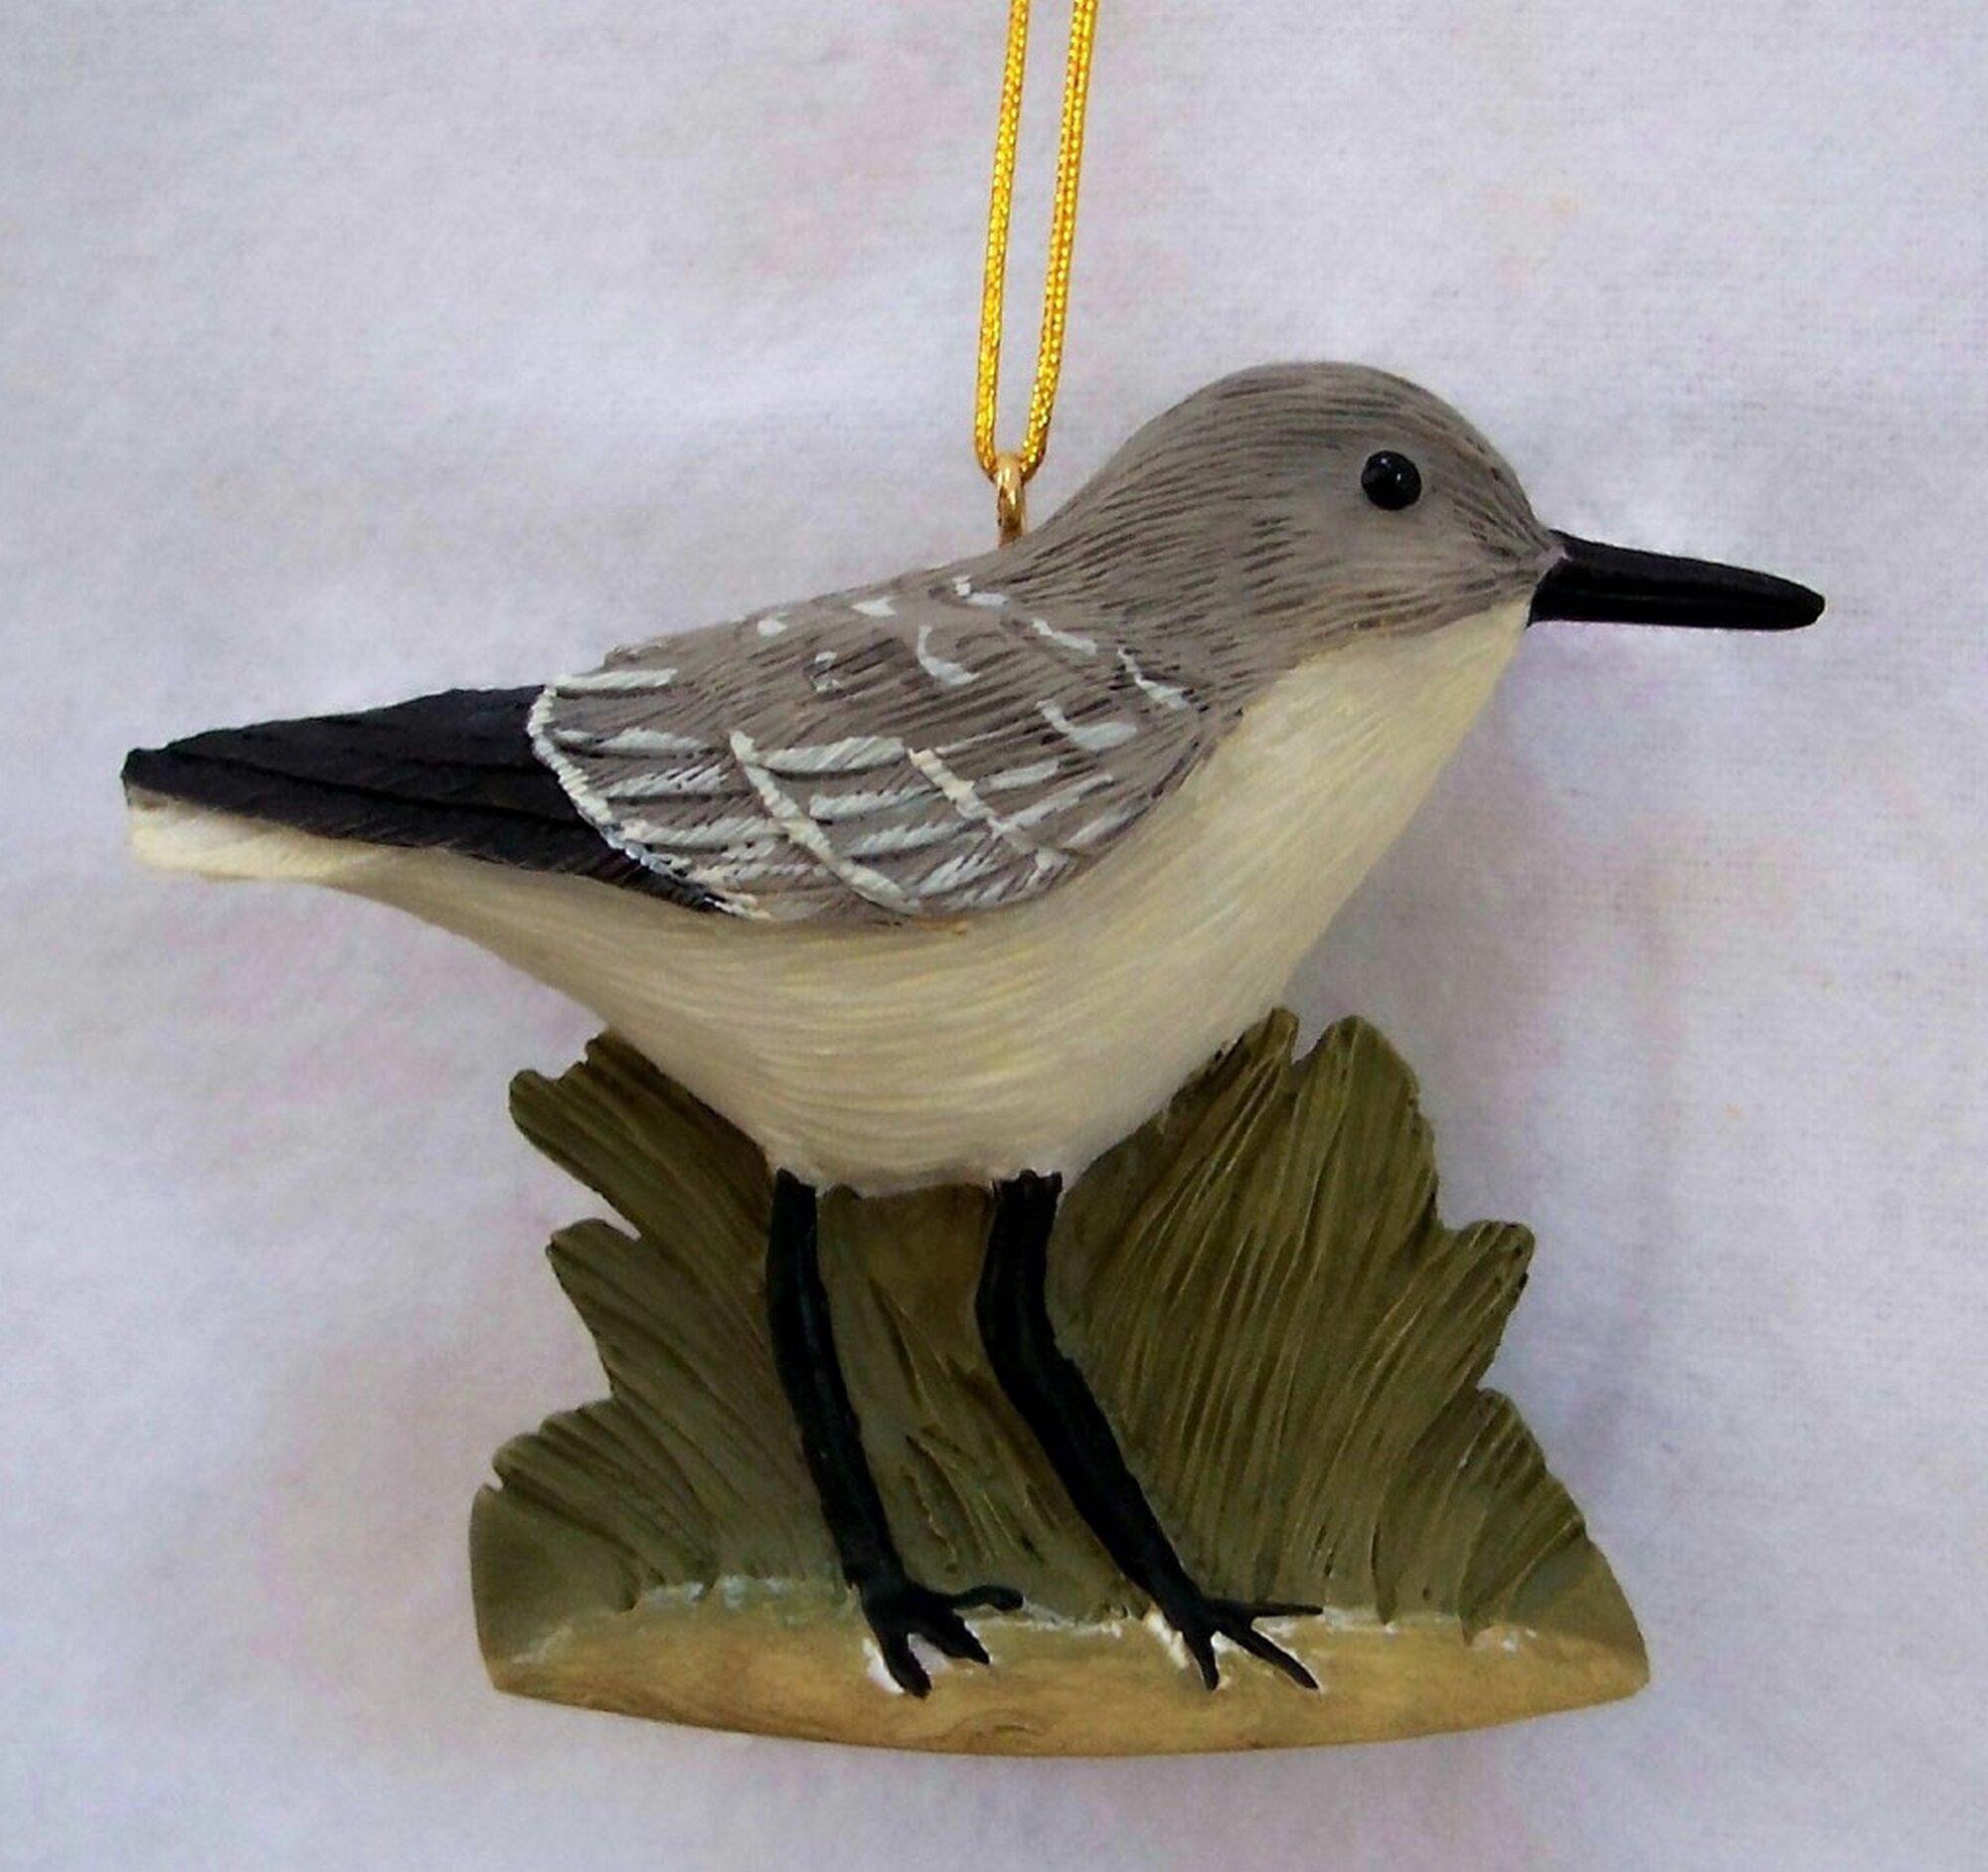 Songbird Essentials Sandpiper Hanging Figurine Wayfair